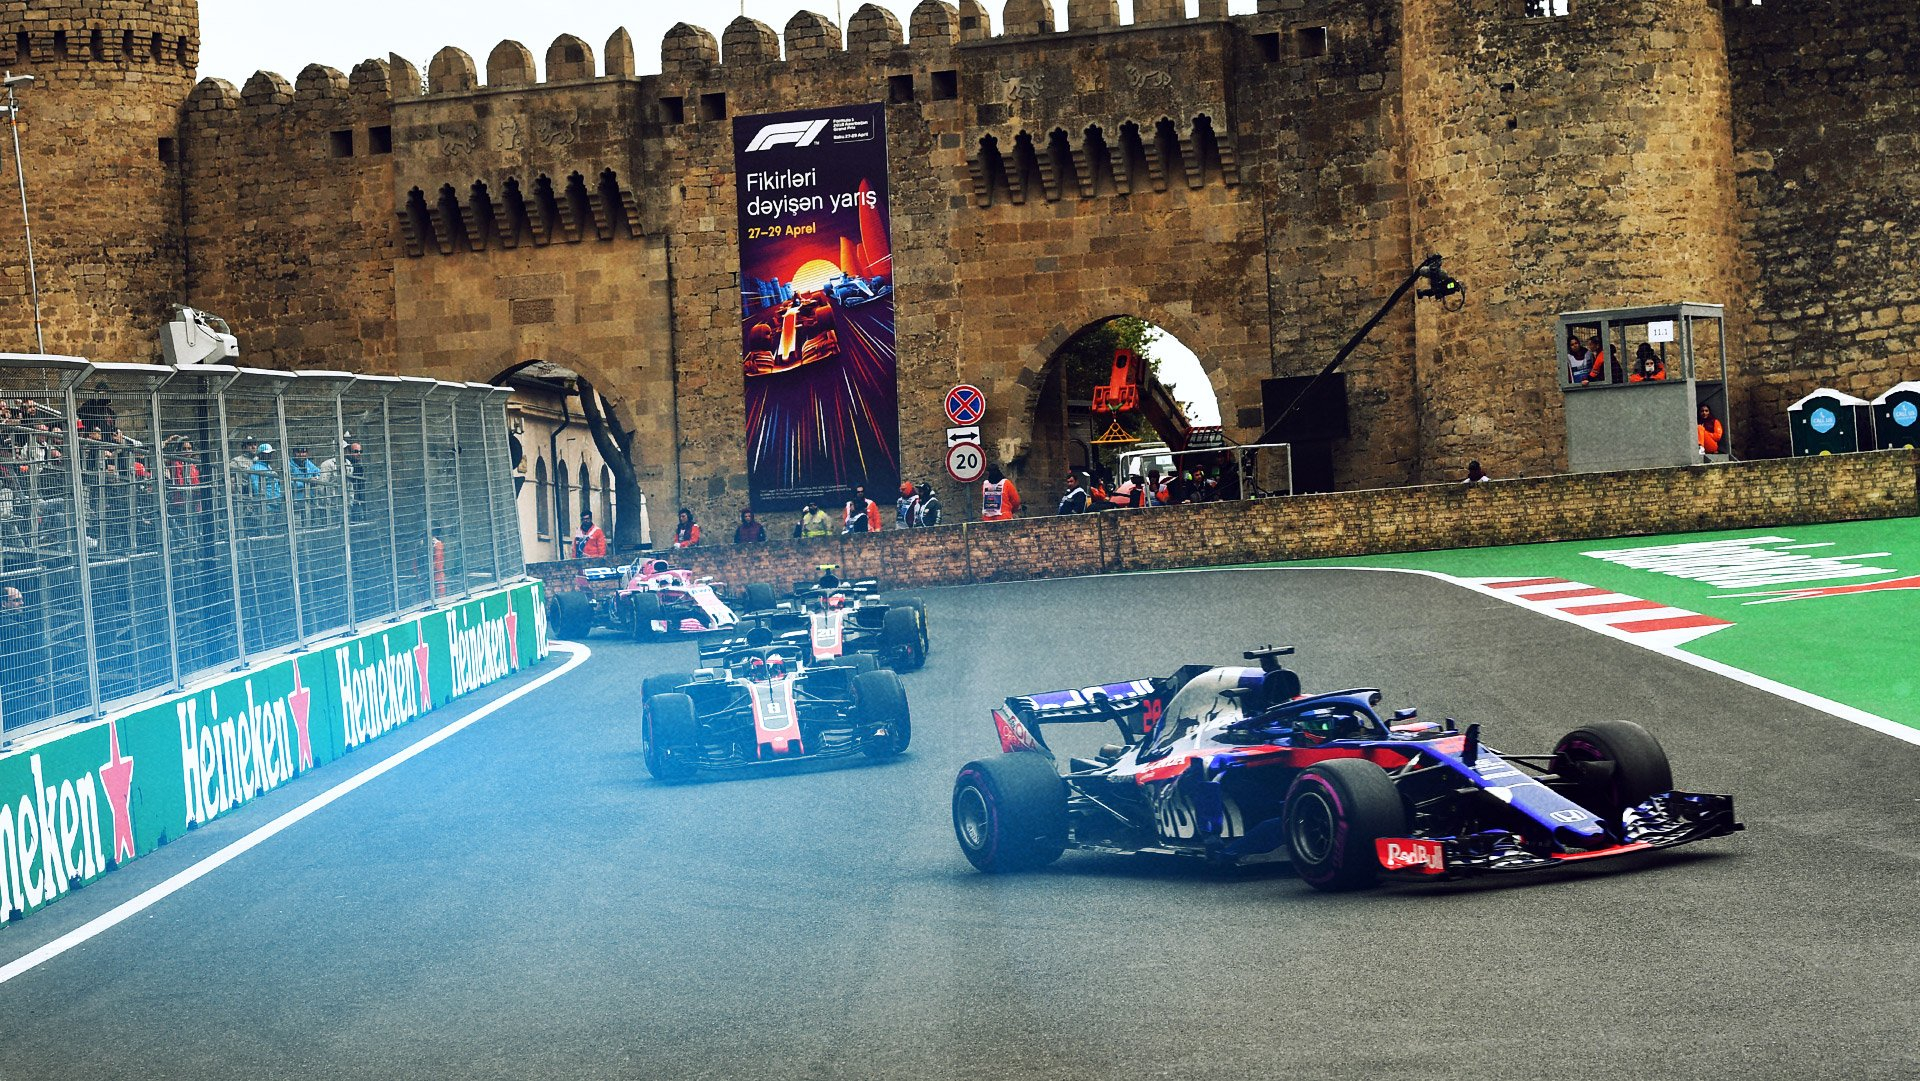 F1 Schedule 2019 - Official Calendar Of Grand Prix Races Formula 1 Calendar 2019 Tickets